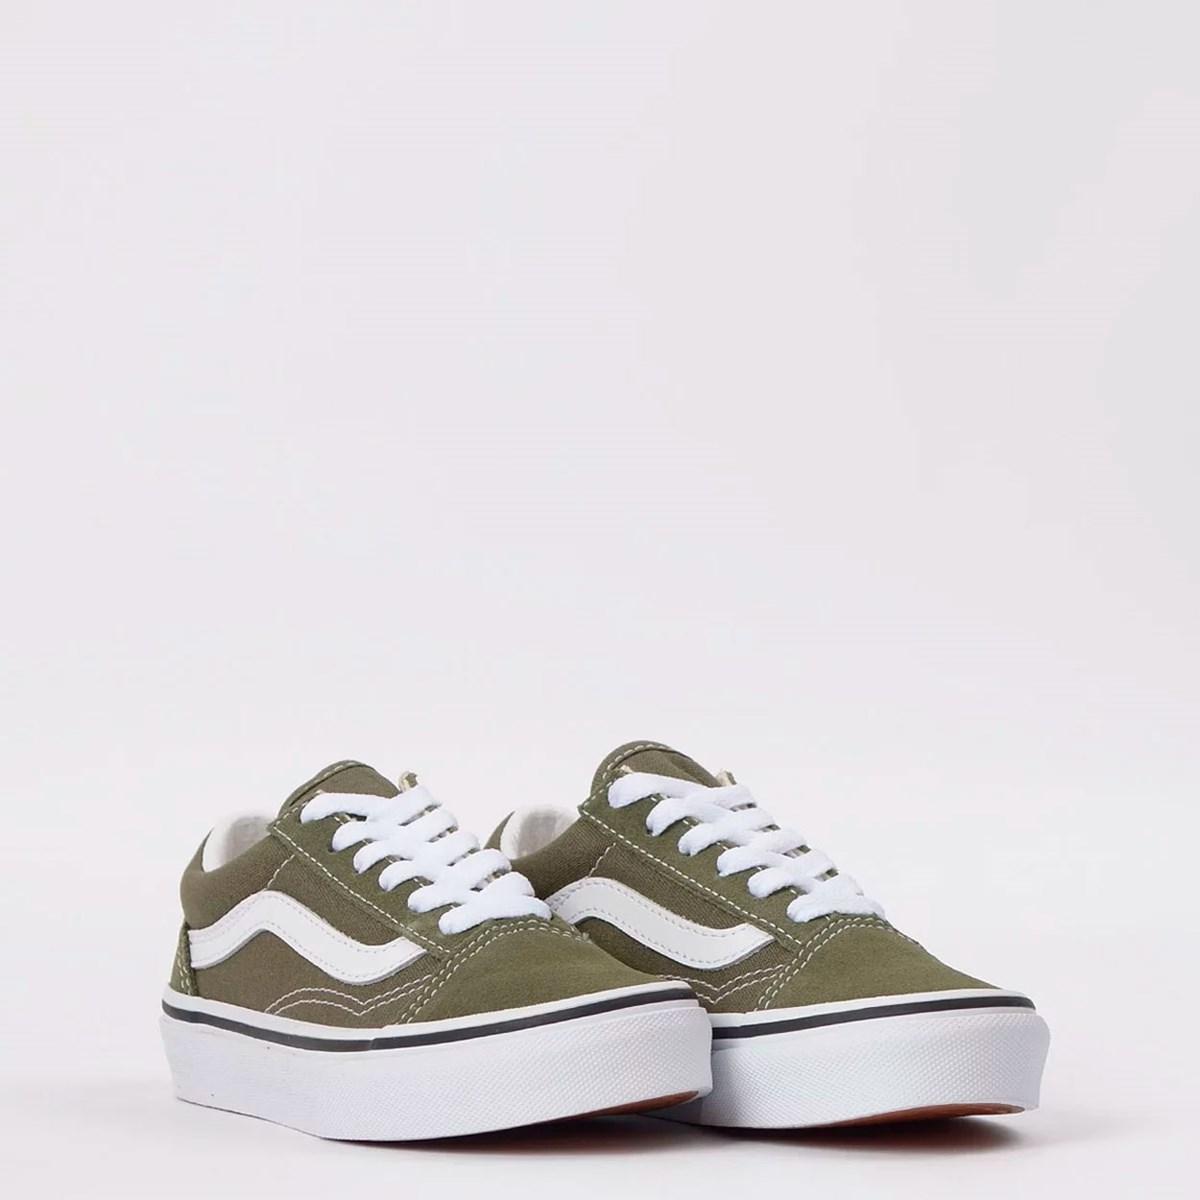 Tênis Vans Kids Old Skool Grape Leaf VN0A4BUU0FI